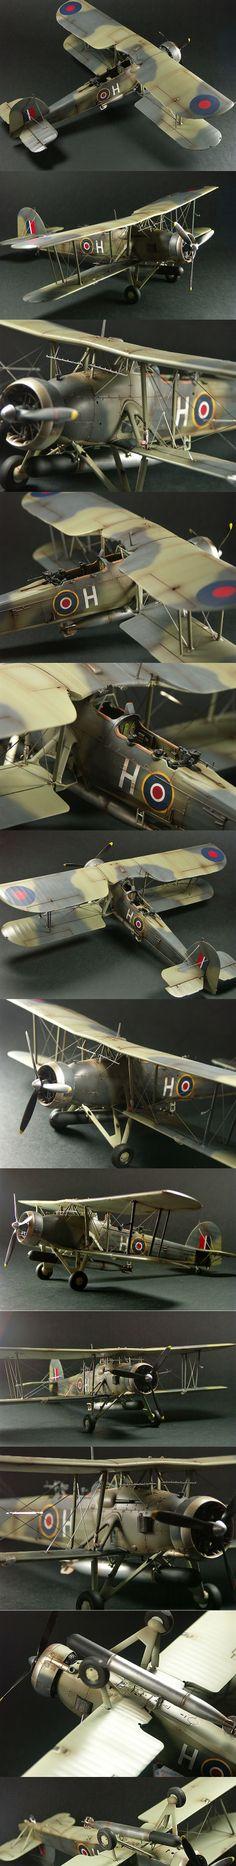 Biplane model